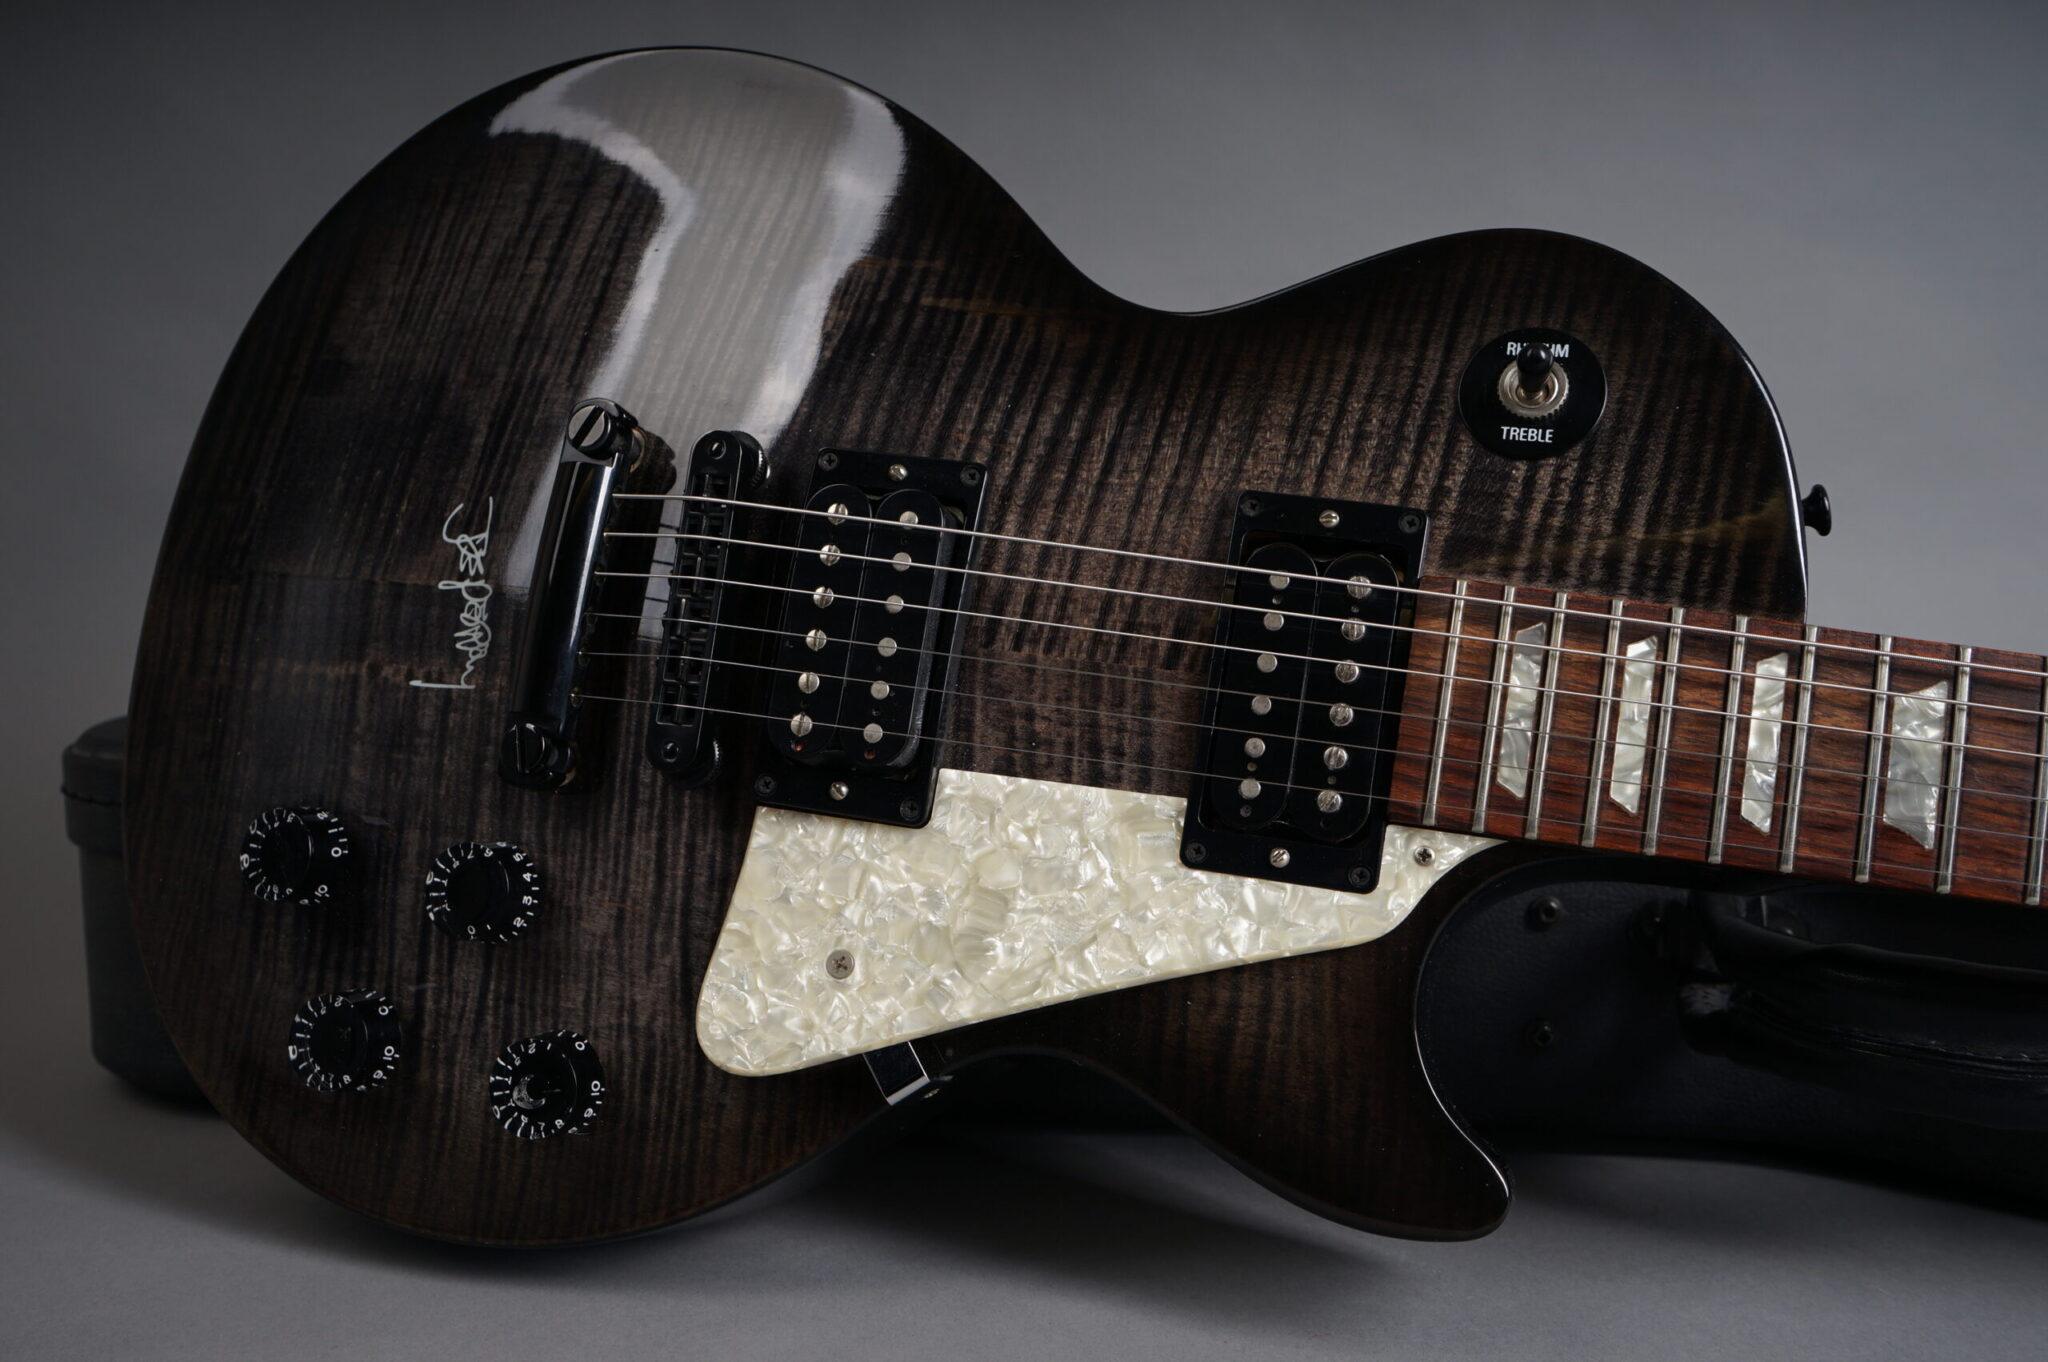 https://guitarpoint.de/app/uploads/products/1997-gibson-joe-perry-les-paul-translucent-blackburst/1997-Gibson-Joe-Perry-Les-Paul-90907493-8-scaled-2048x1362.jpg